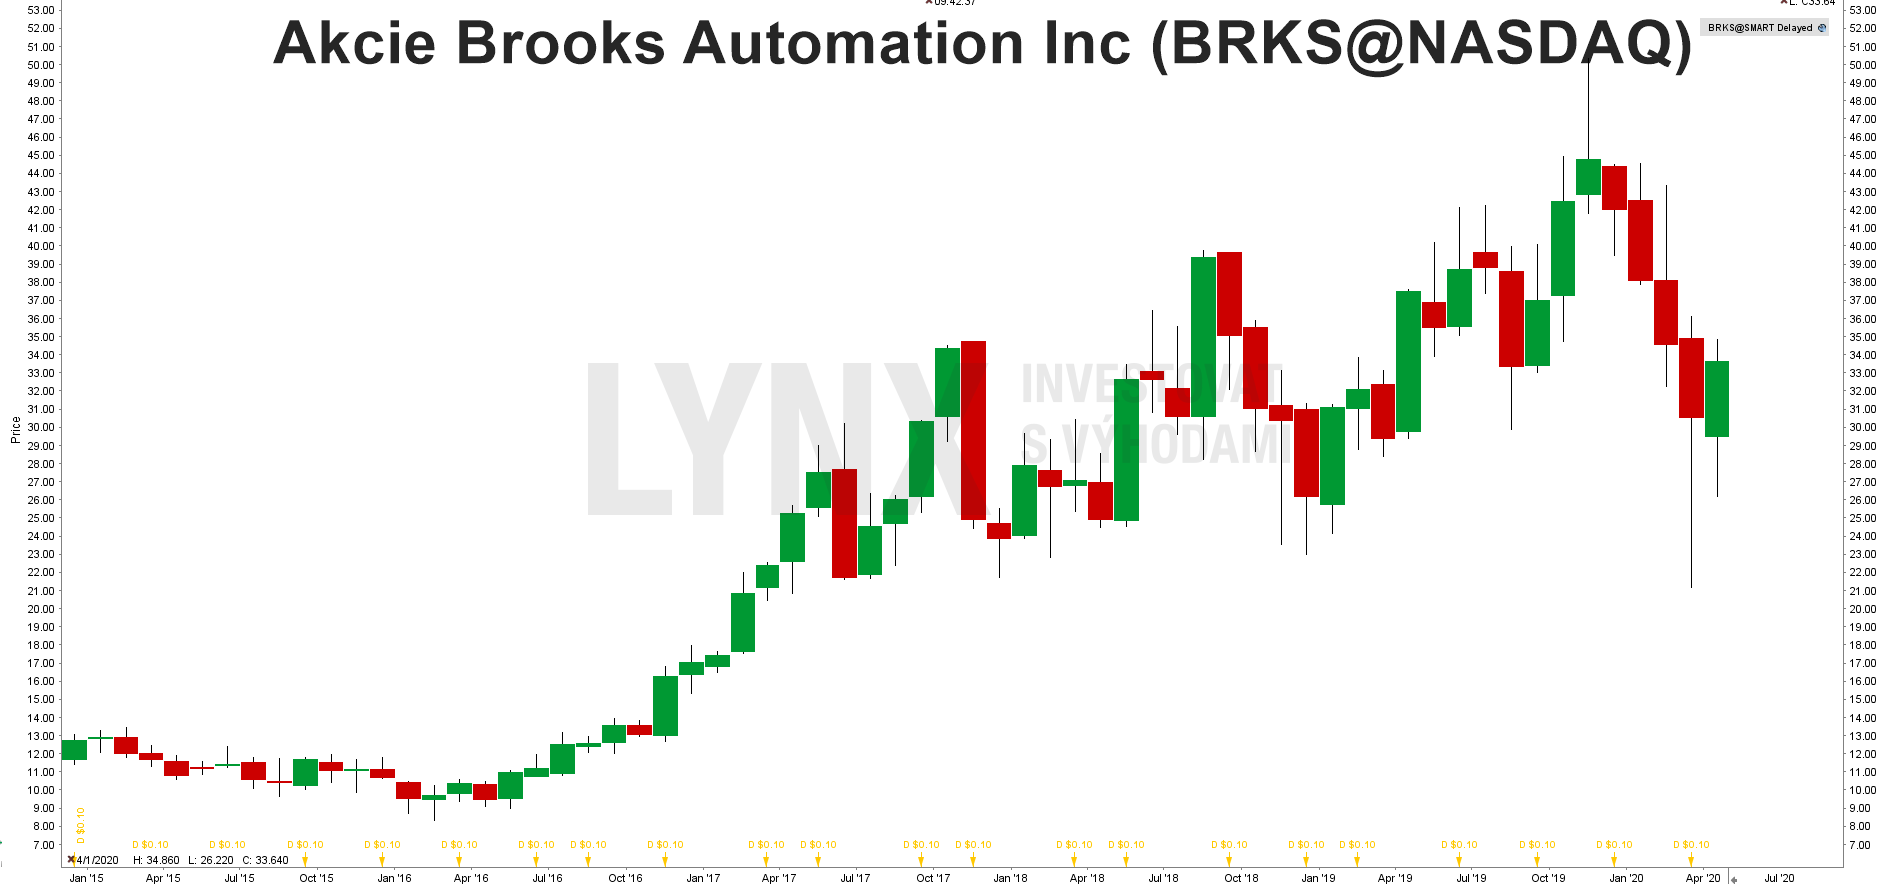 Akcie Brooks automatization